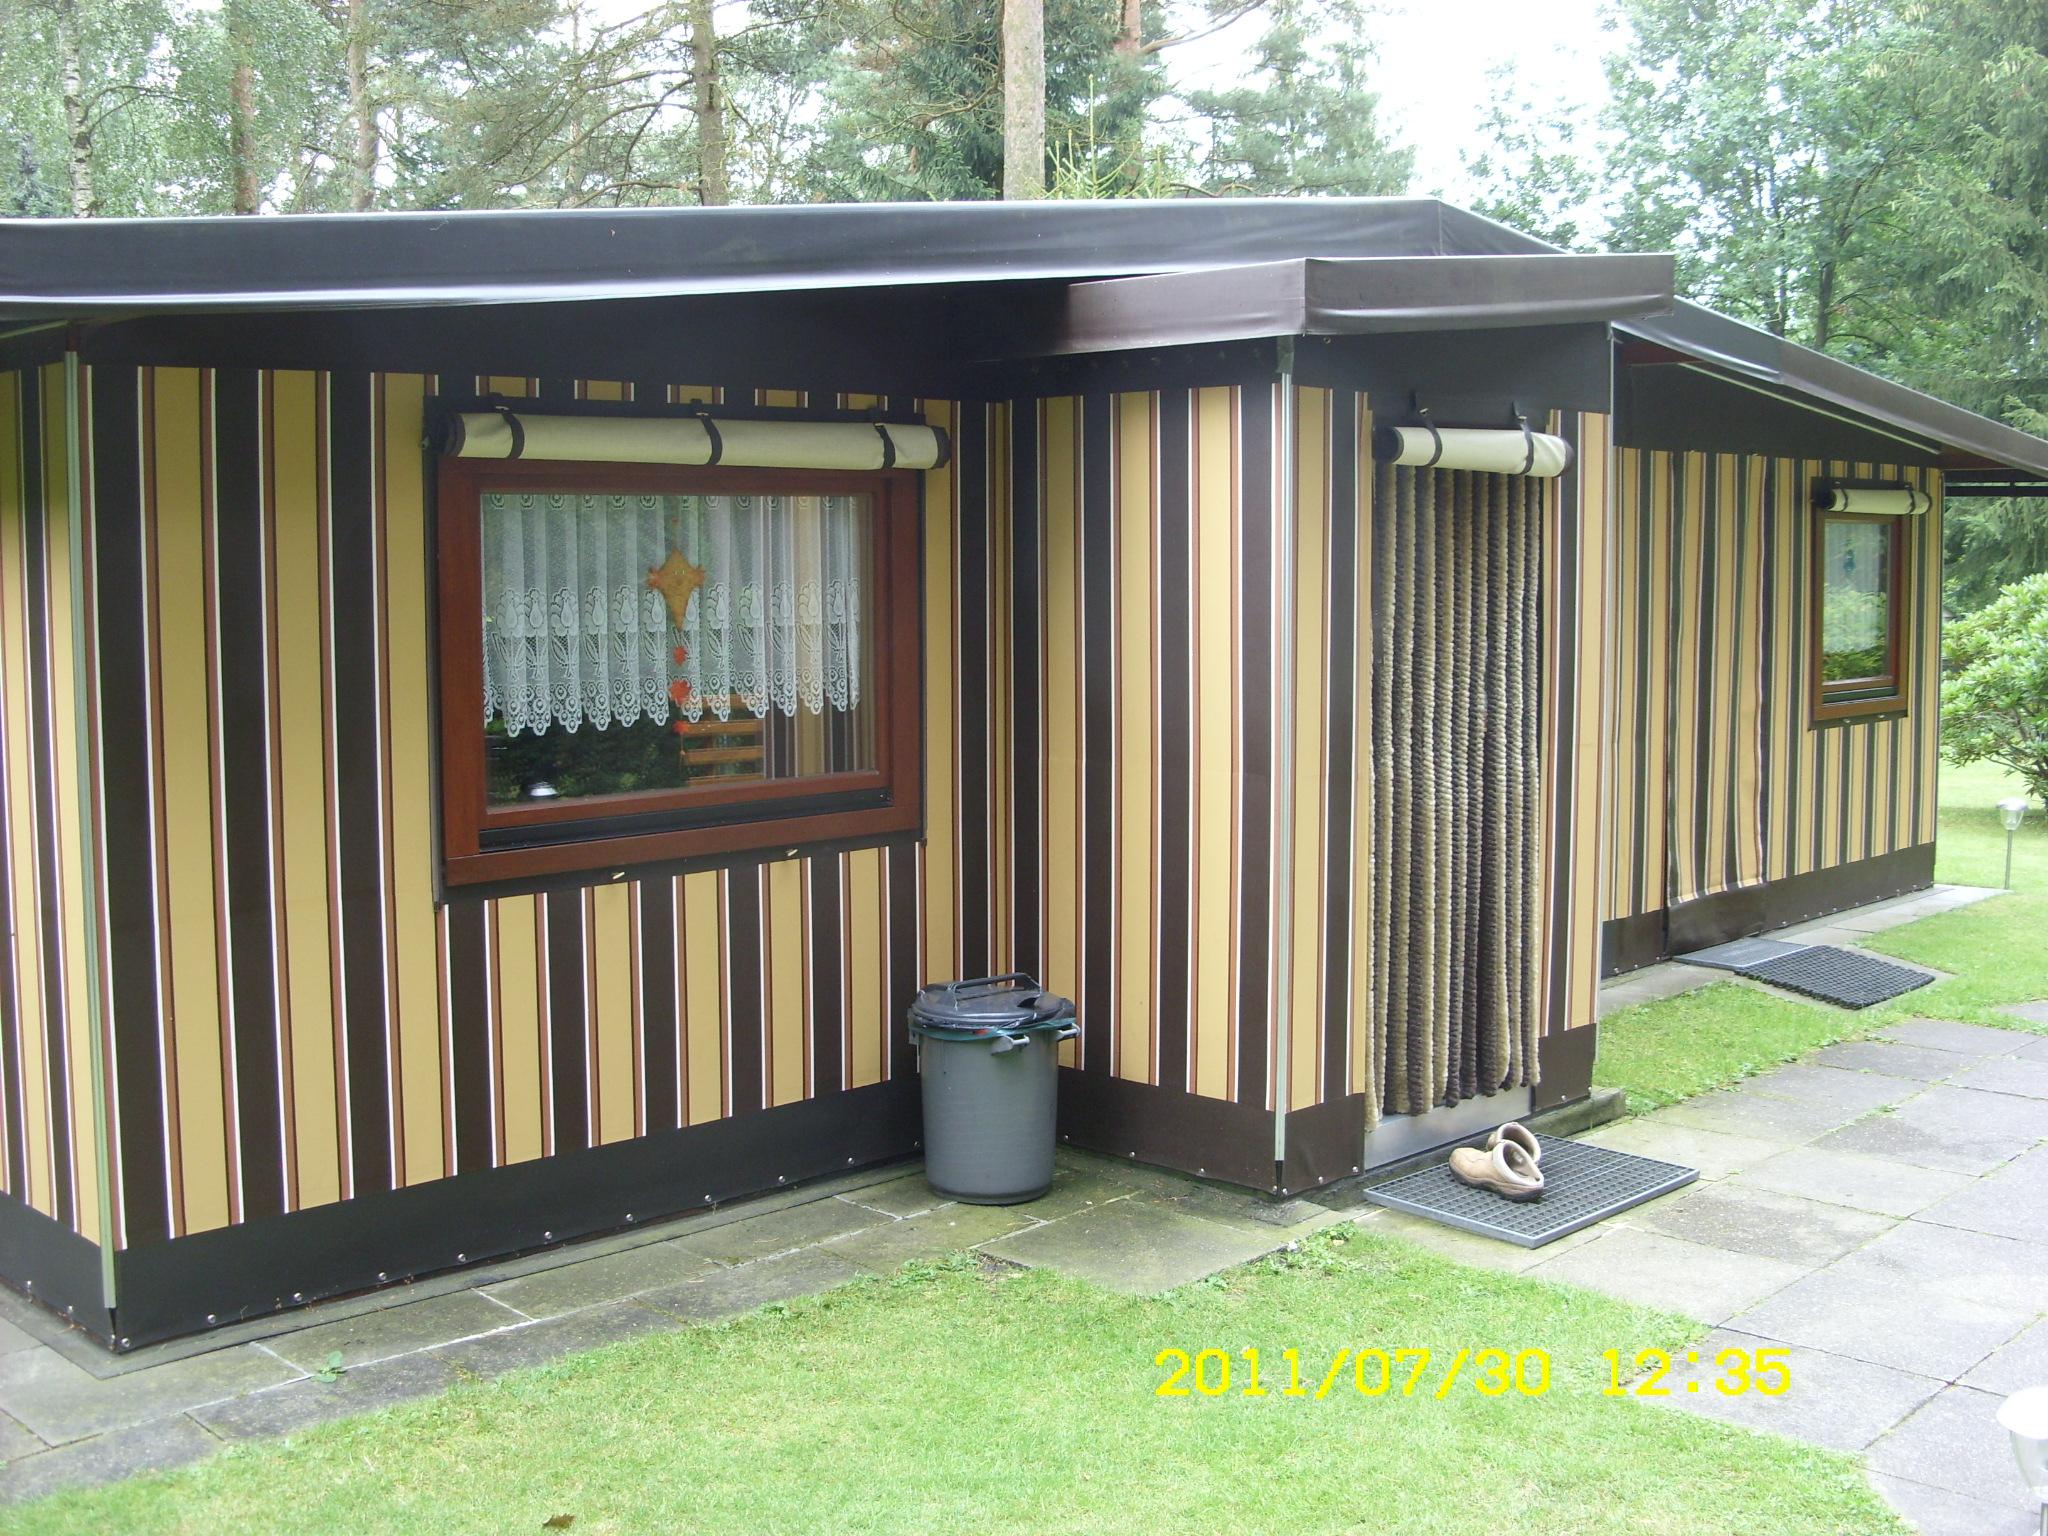 camping kleinanzeigen in rehwinkel. Black Bedroom Furniture Sets. Home Design Ideas